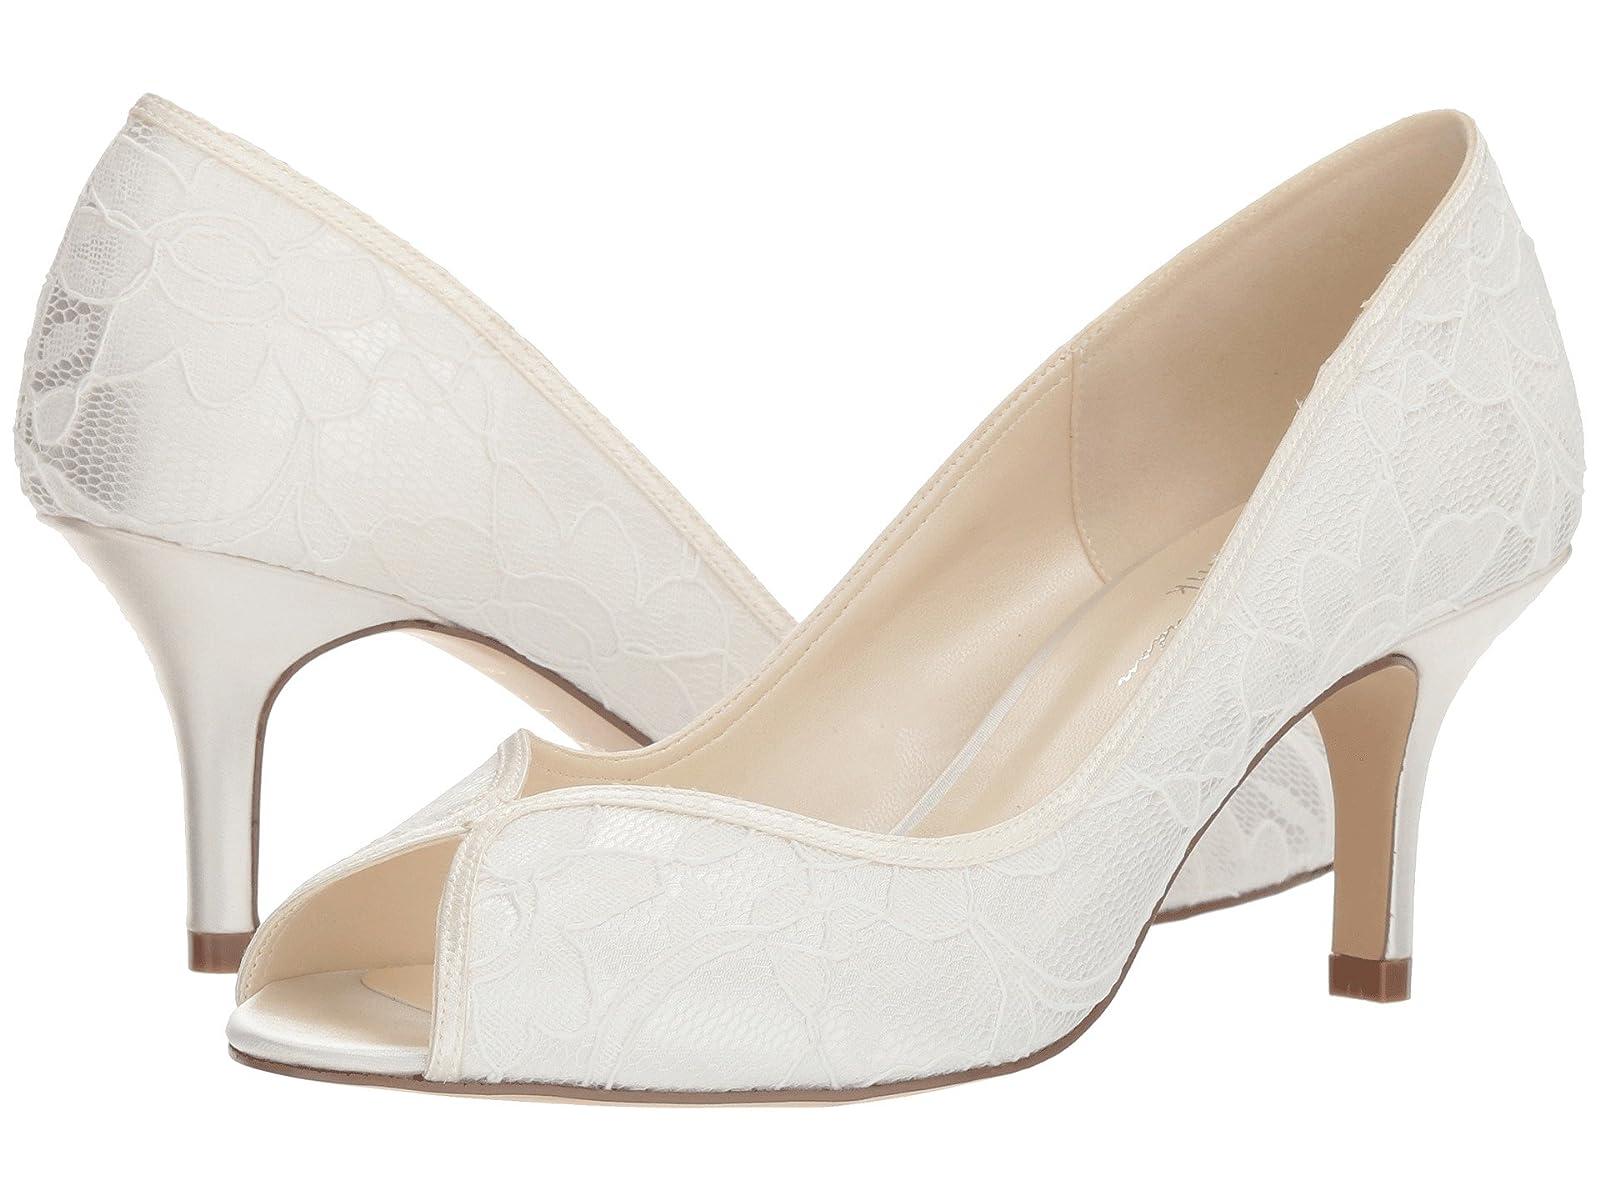 Paradox London Pink ChristabelAtmospheric grades have affordable shoes